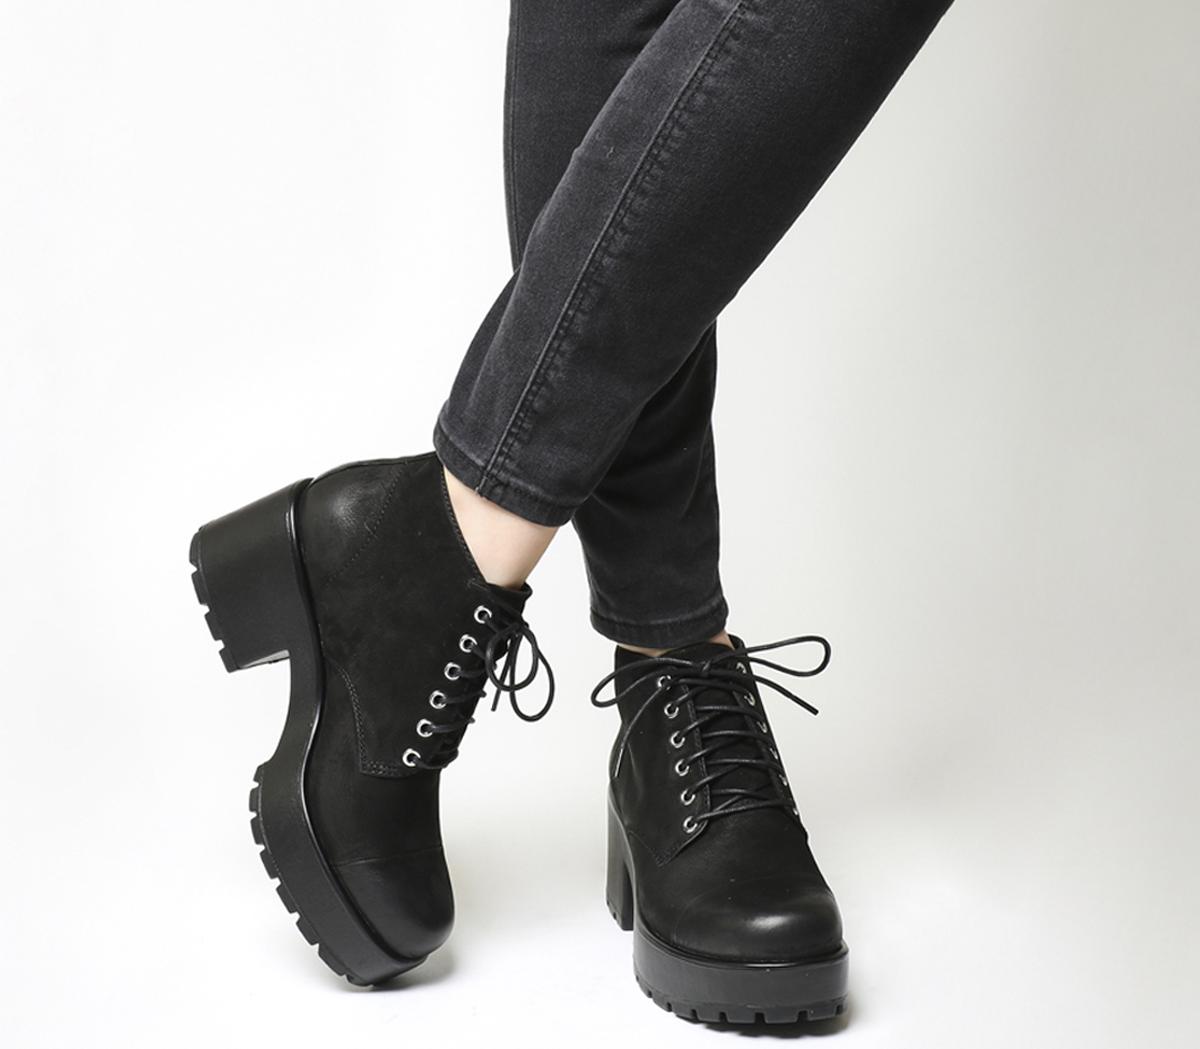 Vagabond Dioon Lace Up Boot Black